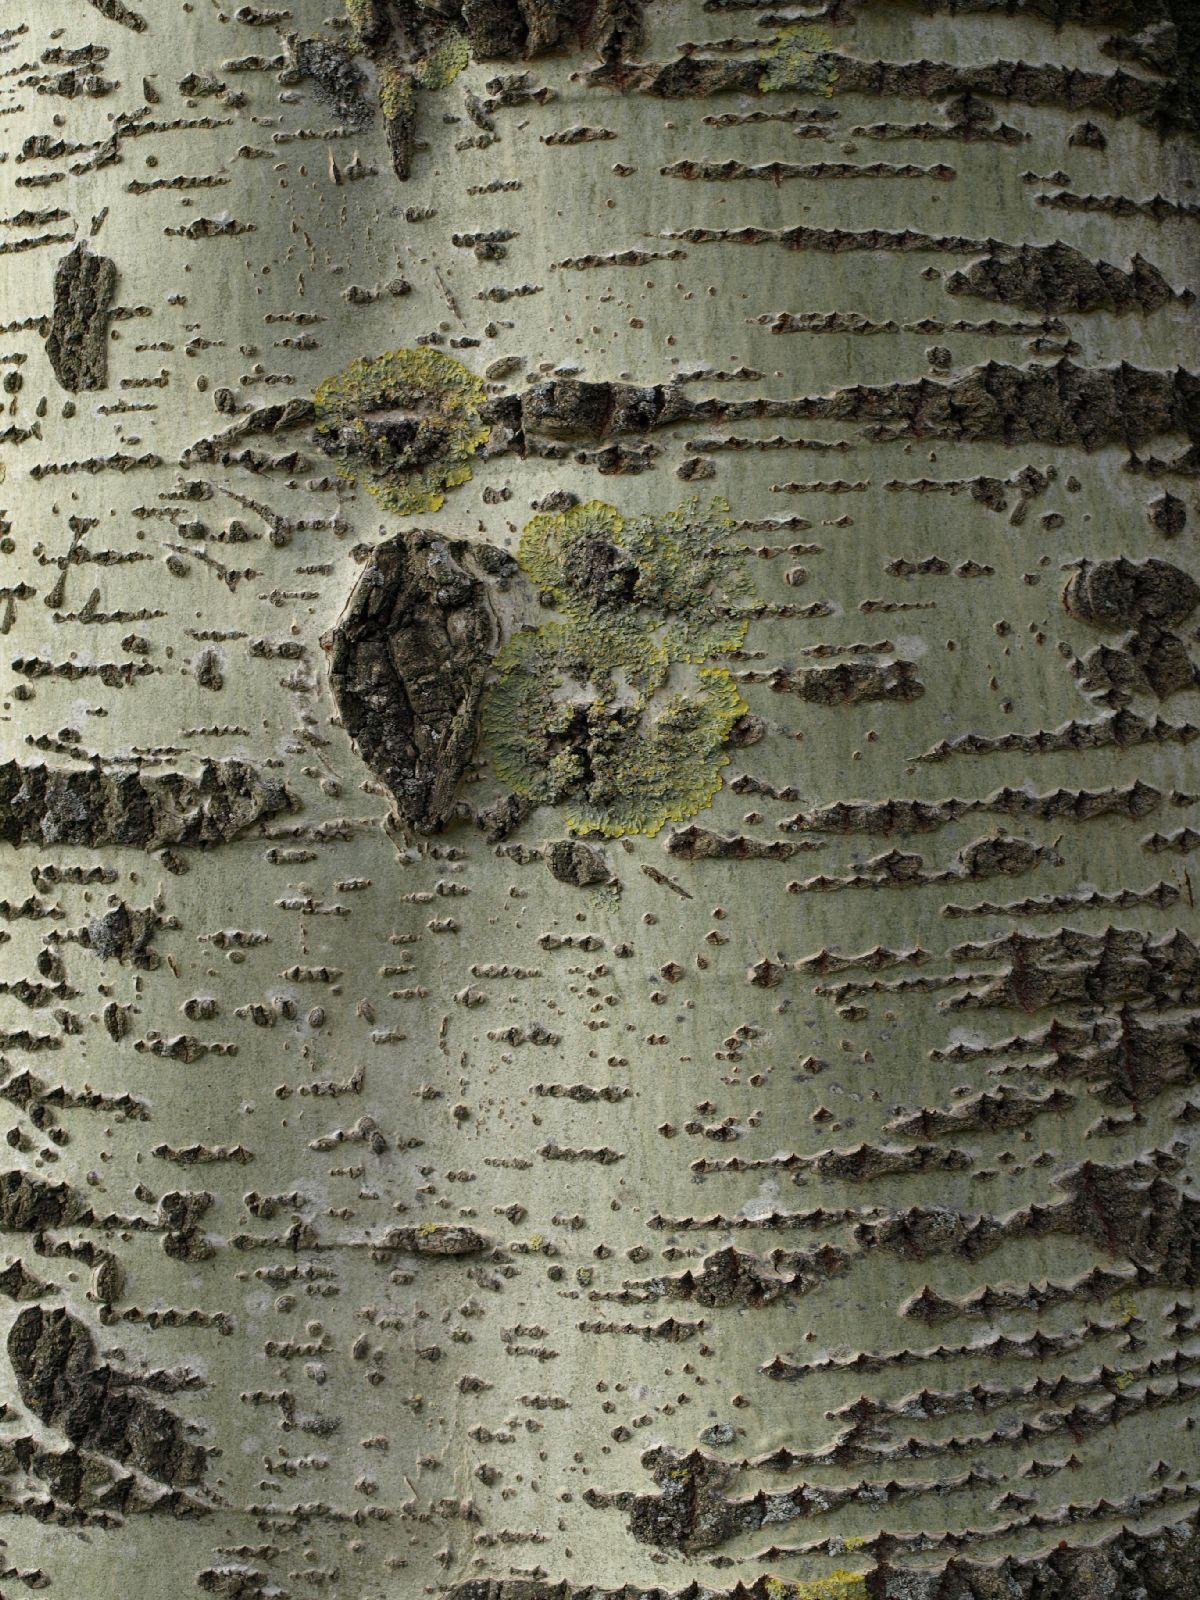 Baum-Rinde_Textur_A_P4171317